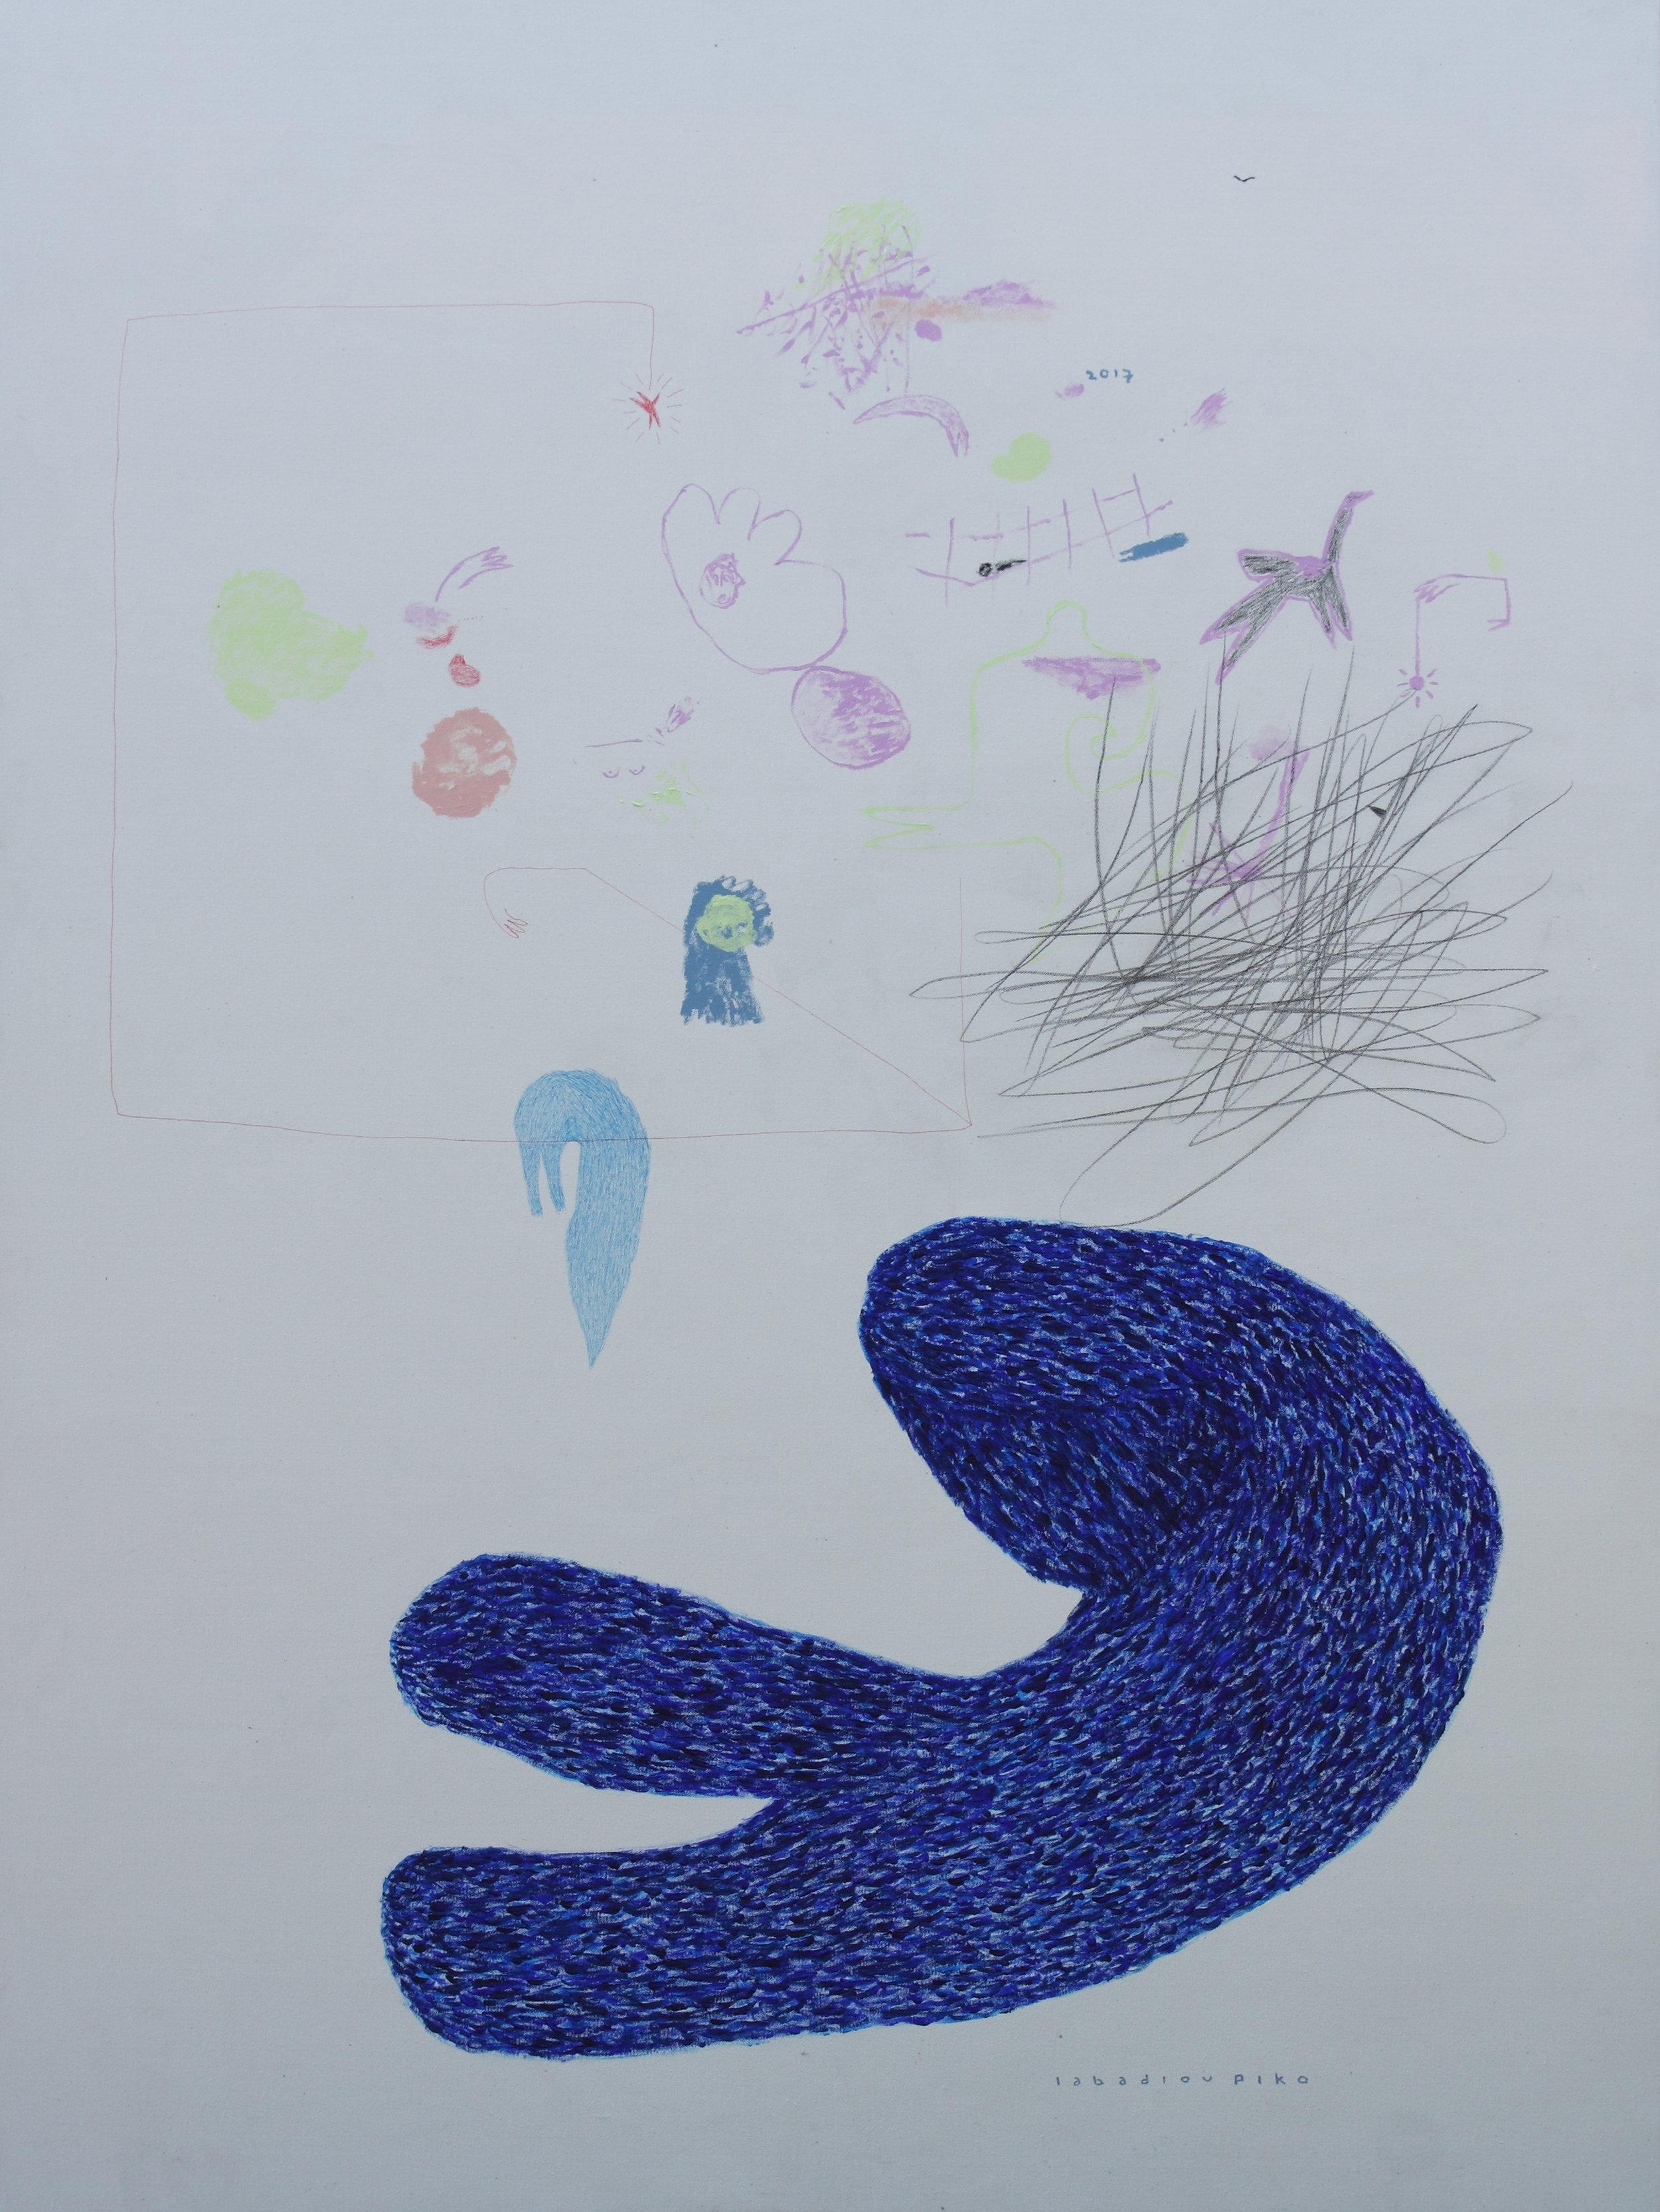 Iabadiou Piko, b.1984 (INDONESIA)  Title: Persepsi Di Atas Putih  Medium: Acrylic, Archival Ink, Pencil on Linen Blend  Dimension: 200 x 150 cm  Year: 2017